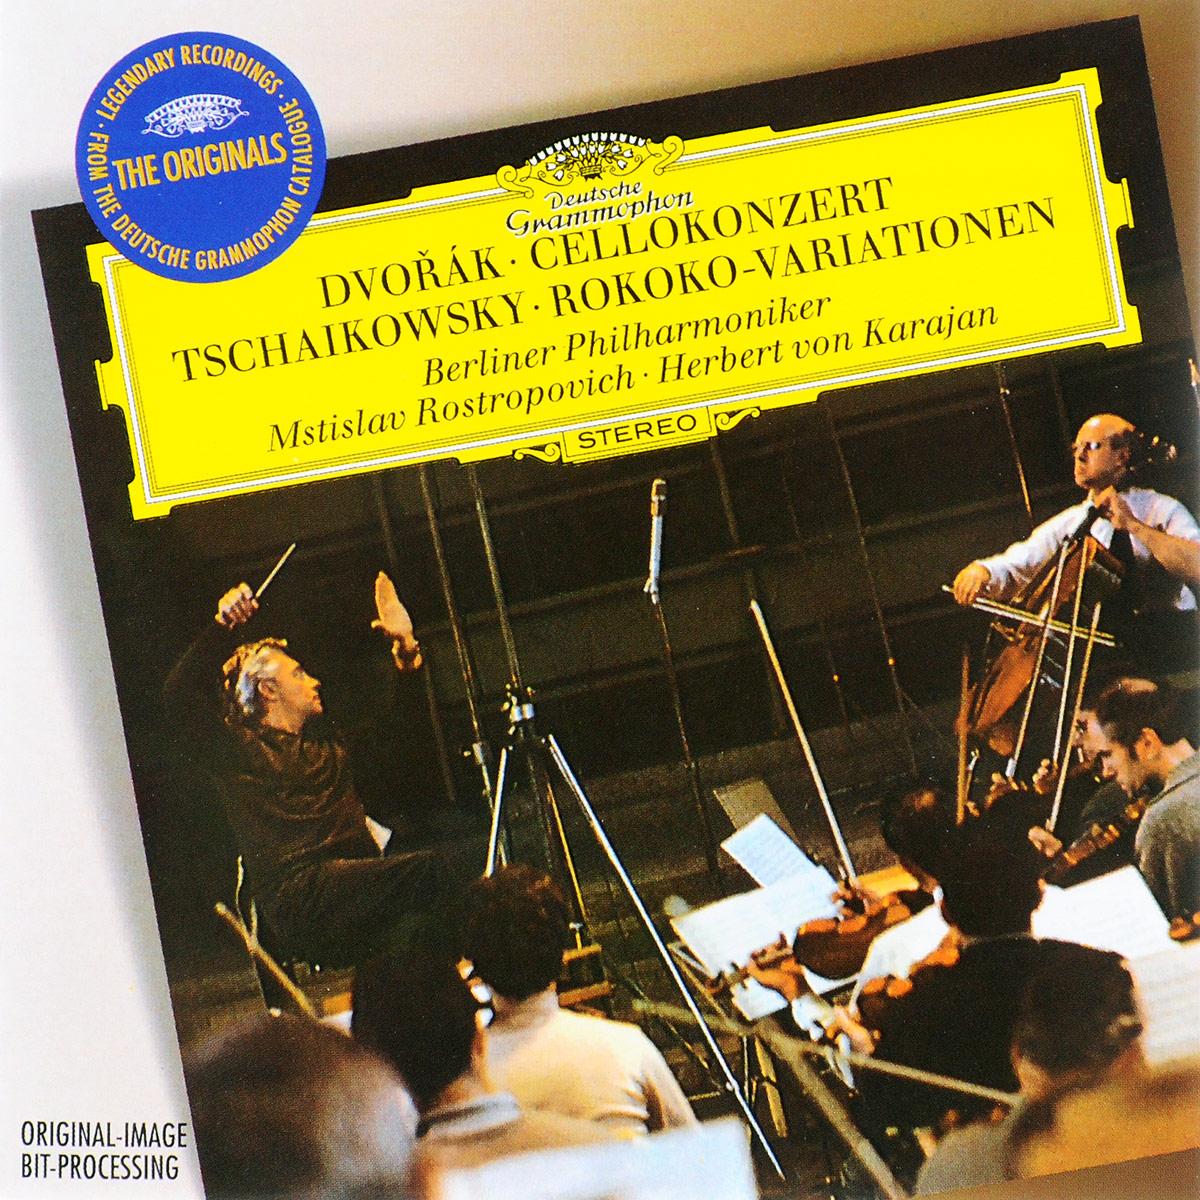 цена на Мстислав Ростропович,Berliner Philharmoniker,Герберт Караян Mstislav Rostropovich, Berliner Philharmoniker, Herbert von Karajan. Dvorak. Cello Concerto / Tchaikovsky. Variations